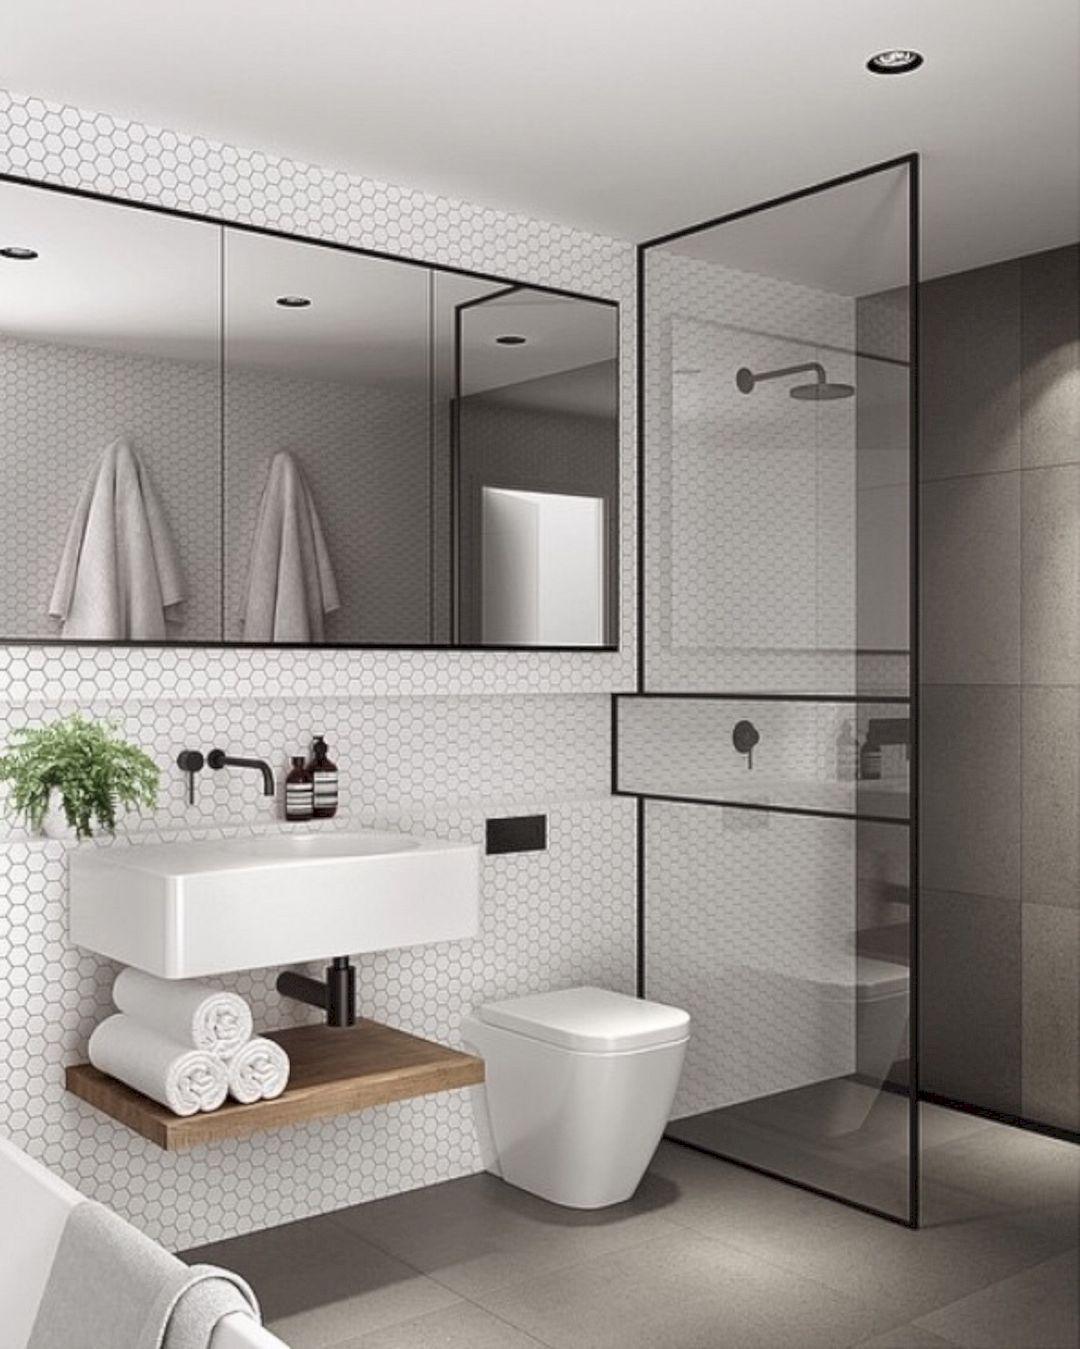 16 Small Bathroom Renovation Ideas Bathroom Interior Modern Bathroom Design Small Bathroom